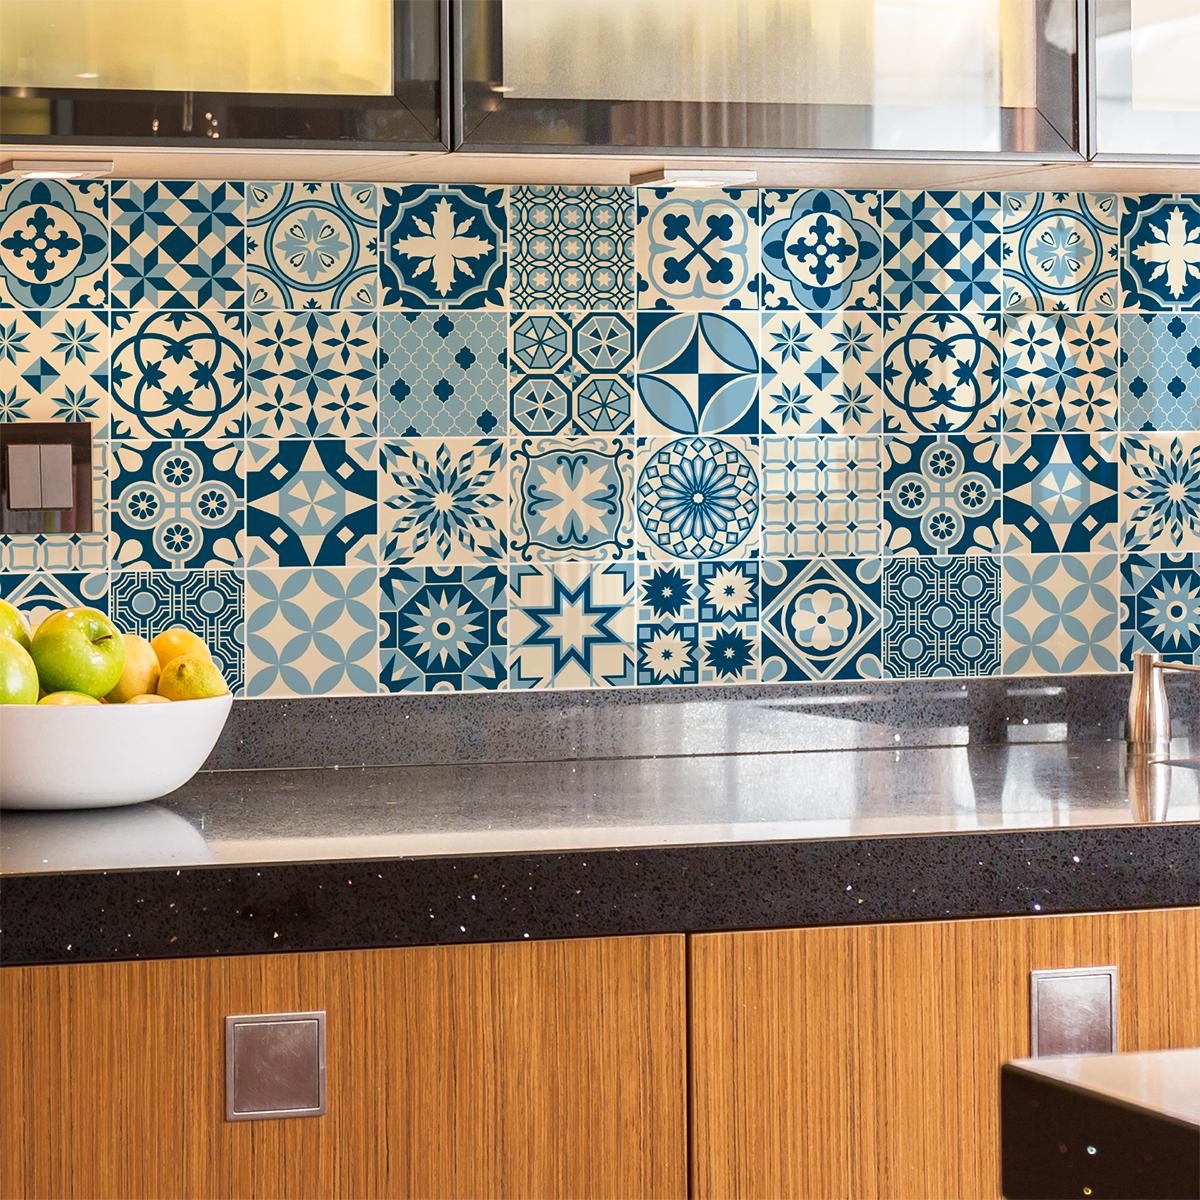 24 stickers carrelages azulejos miamo cuisine carrelages. Black Bedroom Furniture Sets. Home Design Ideas